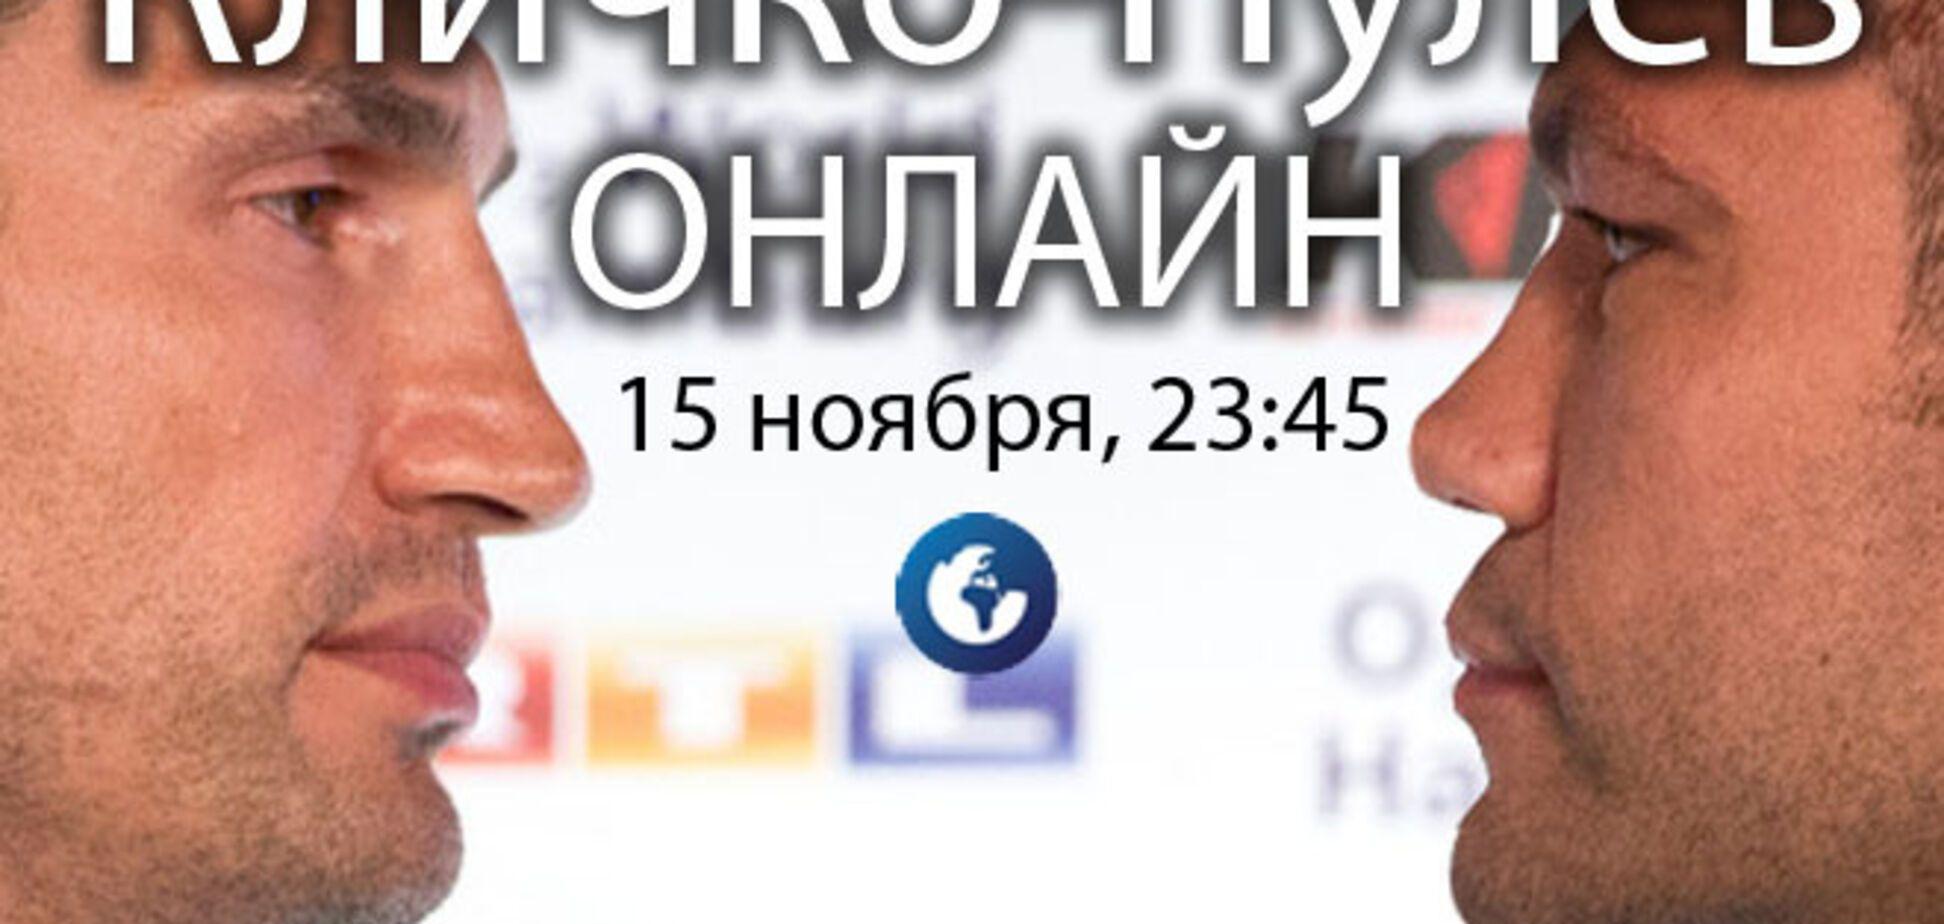 Кличко - Пулев: онлайн-трансляция боя